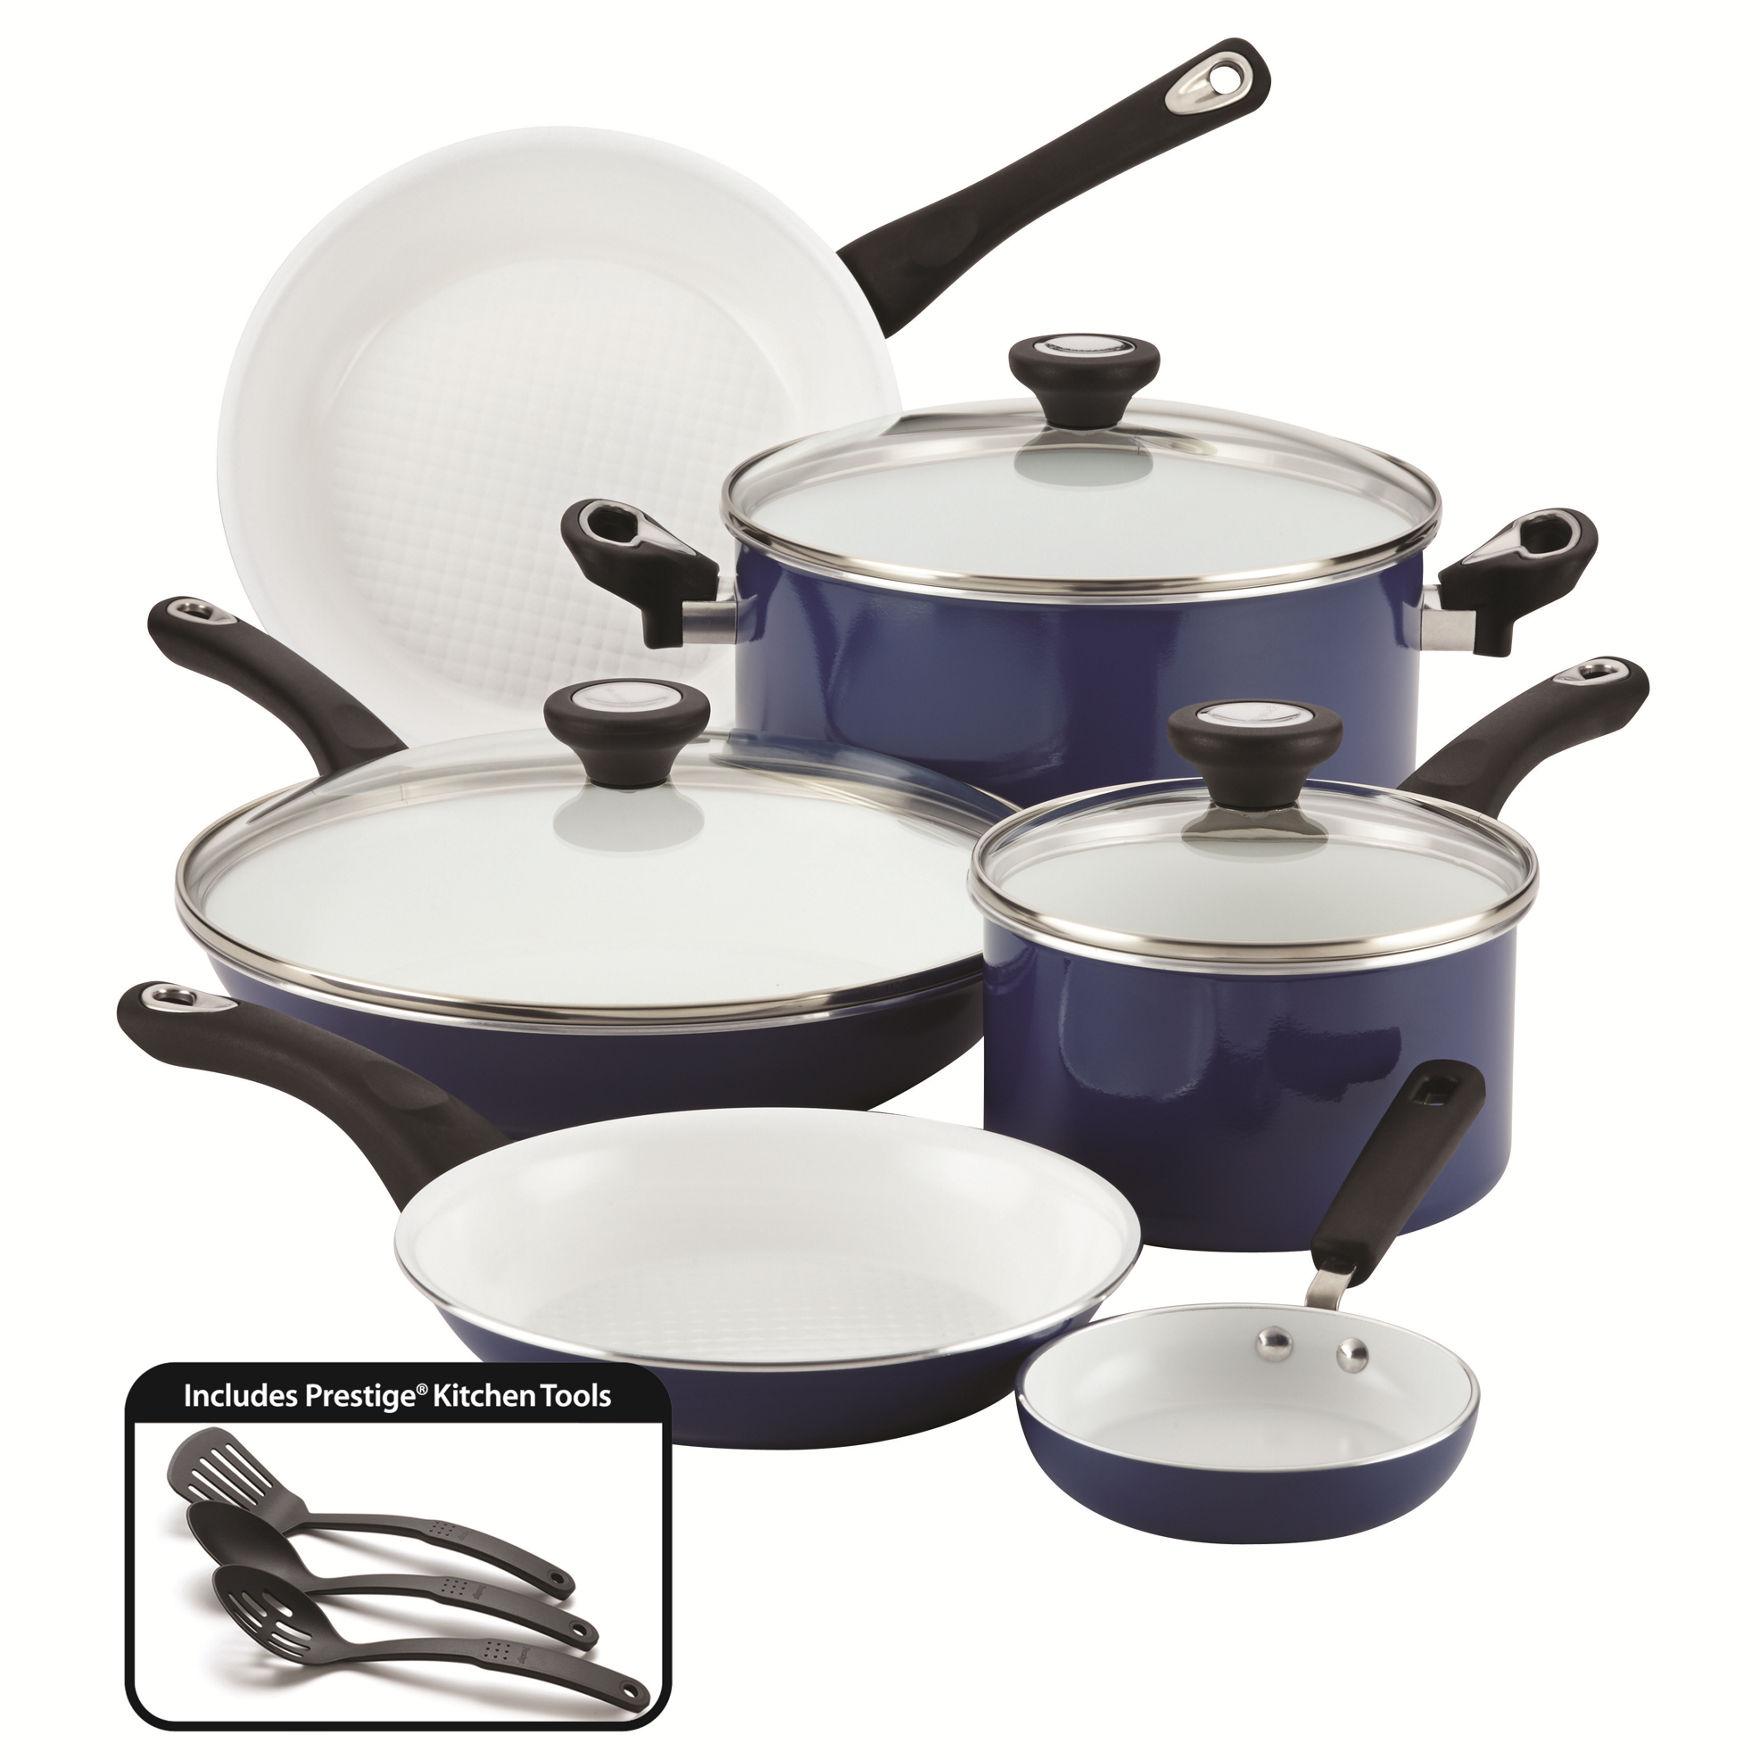 Farberware 12-pc. Purecook Ceramic Non-Stick Cookware Set ...